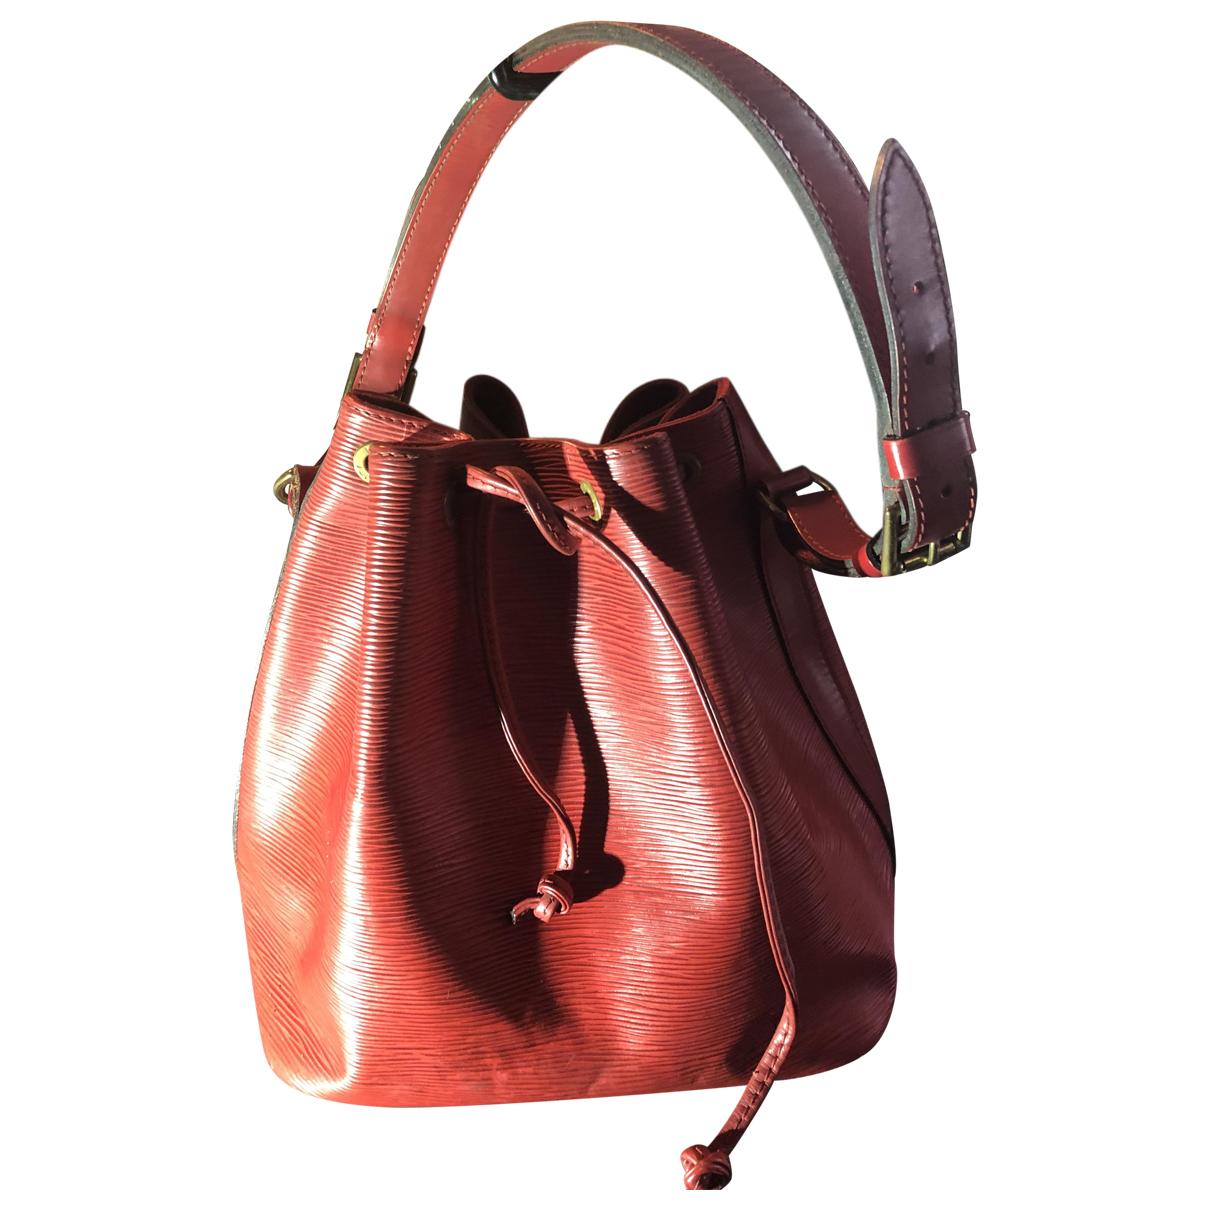 Louis Vuitton Noé Red Leather handbag for Women N